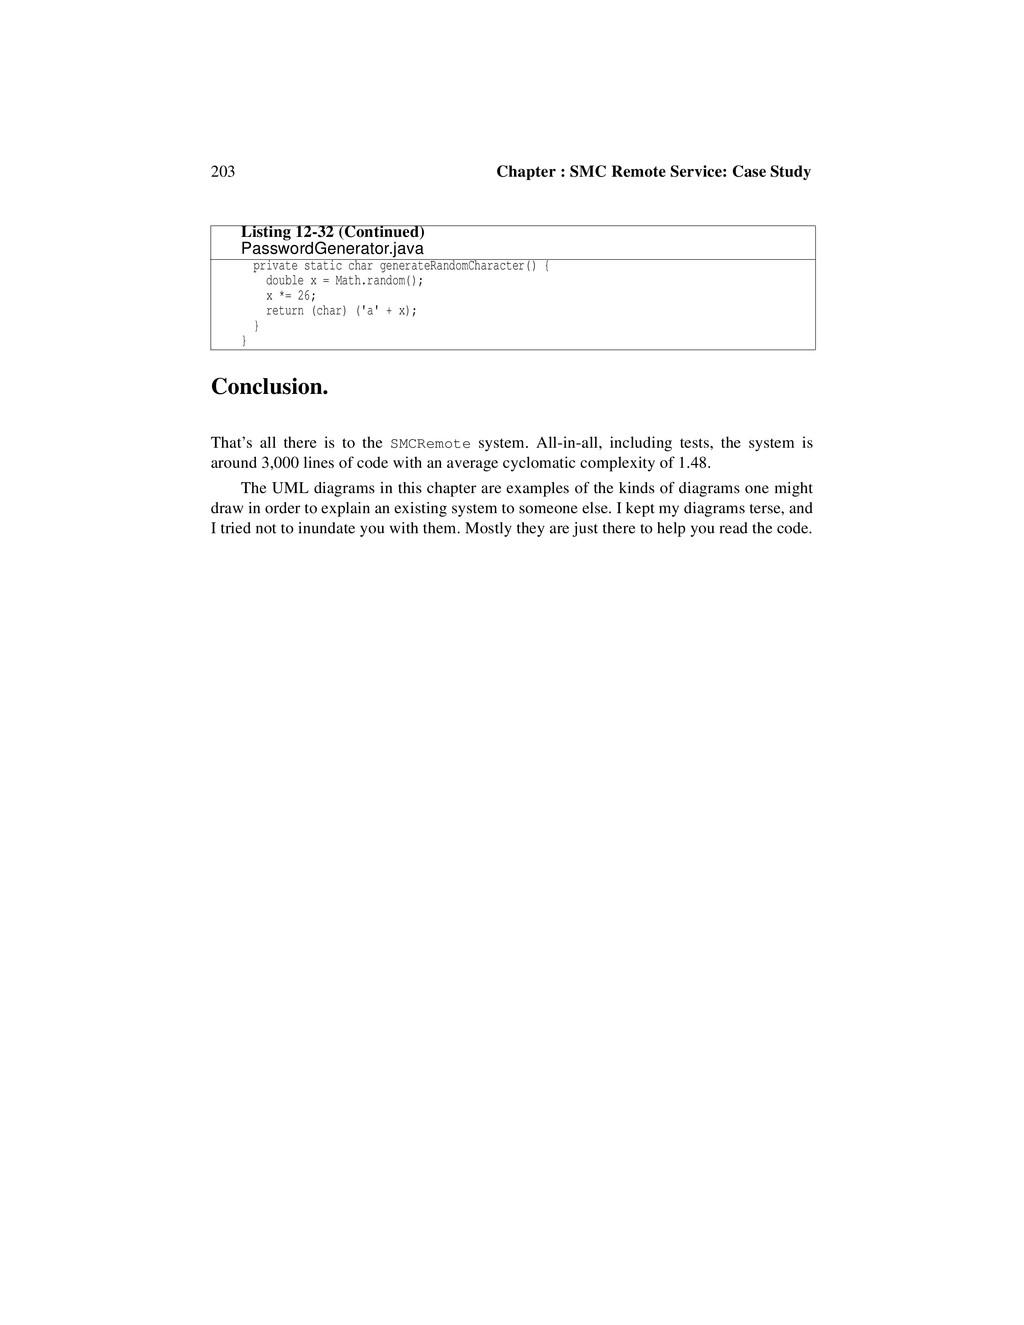 203 Chapter : SMC Remote Service: Case Study Co...